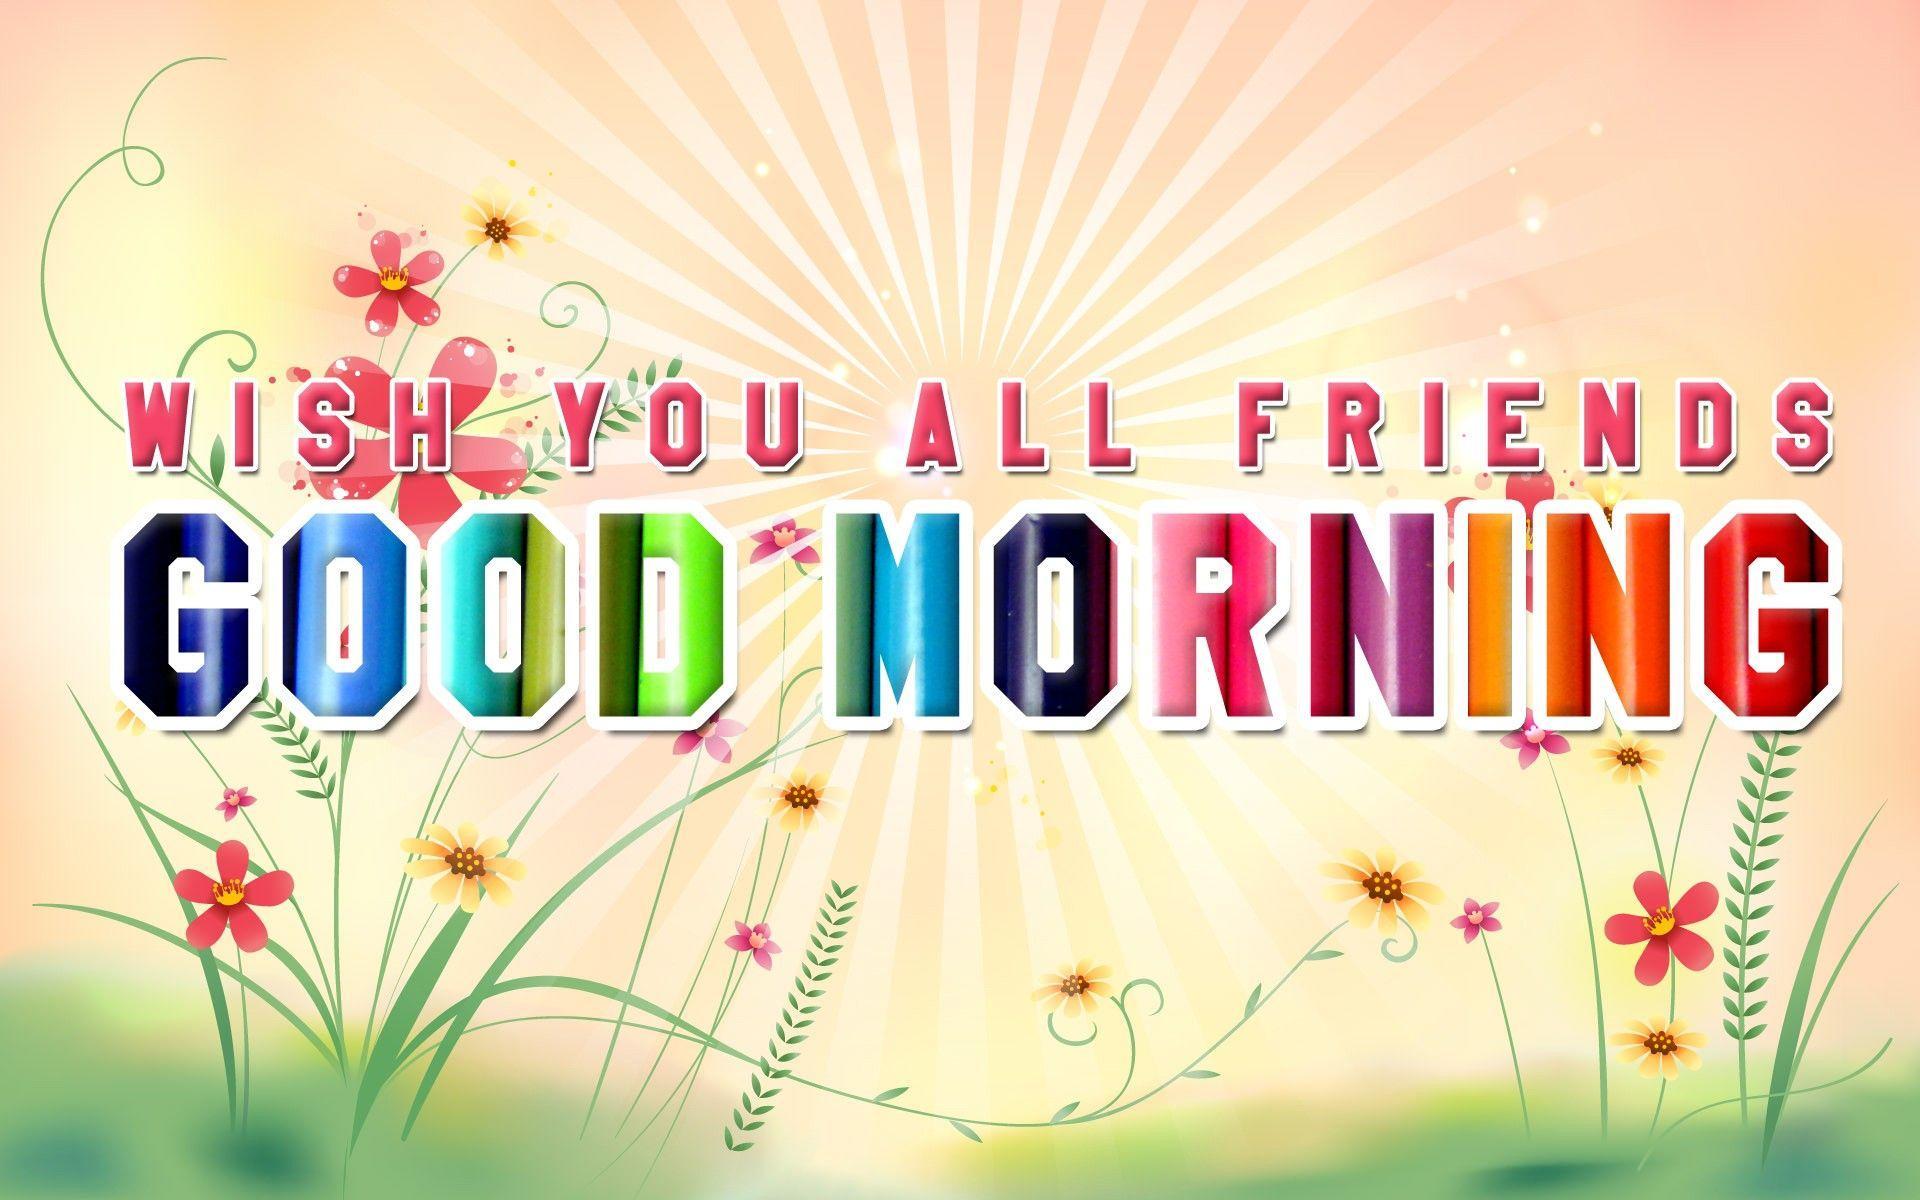 Wallpaper download good - Good Morning Hd Wallpaper Free Download Hd Free Wallpapers Download